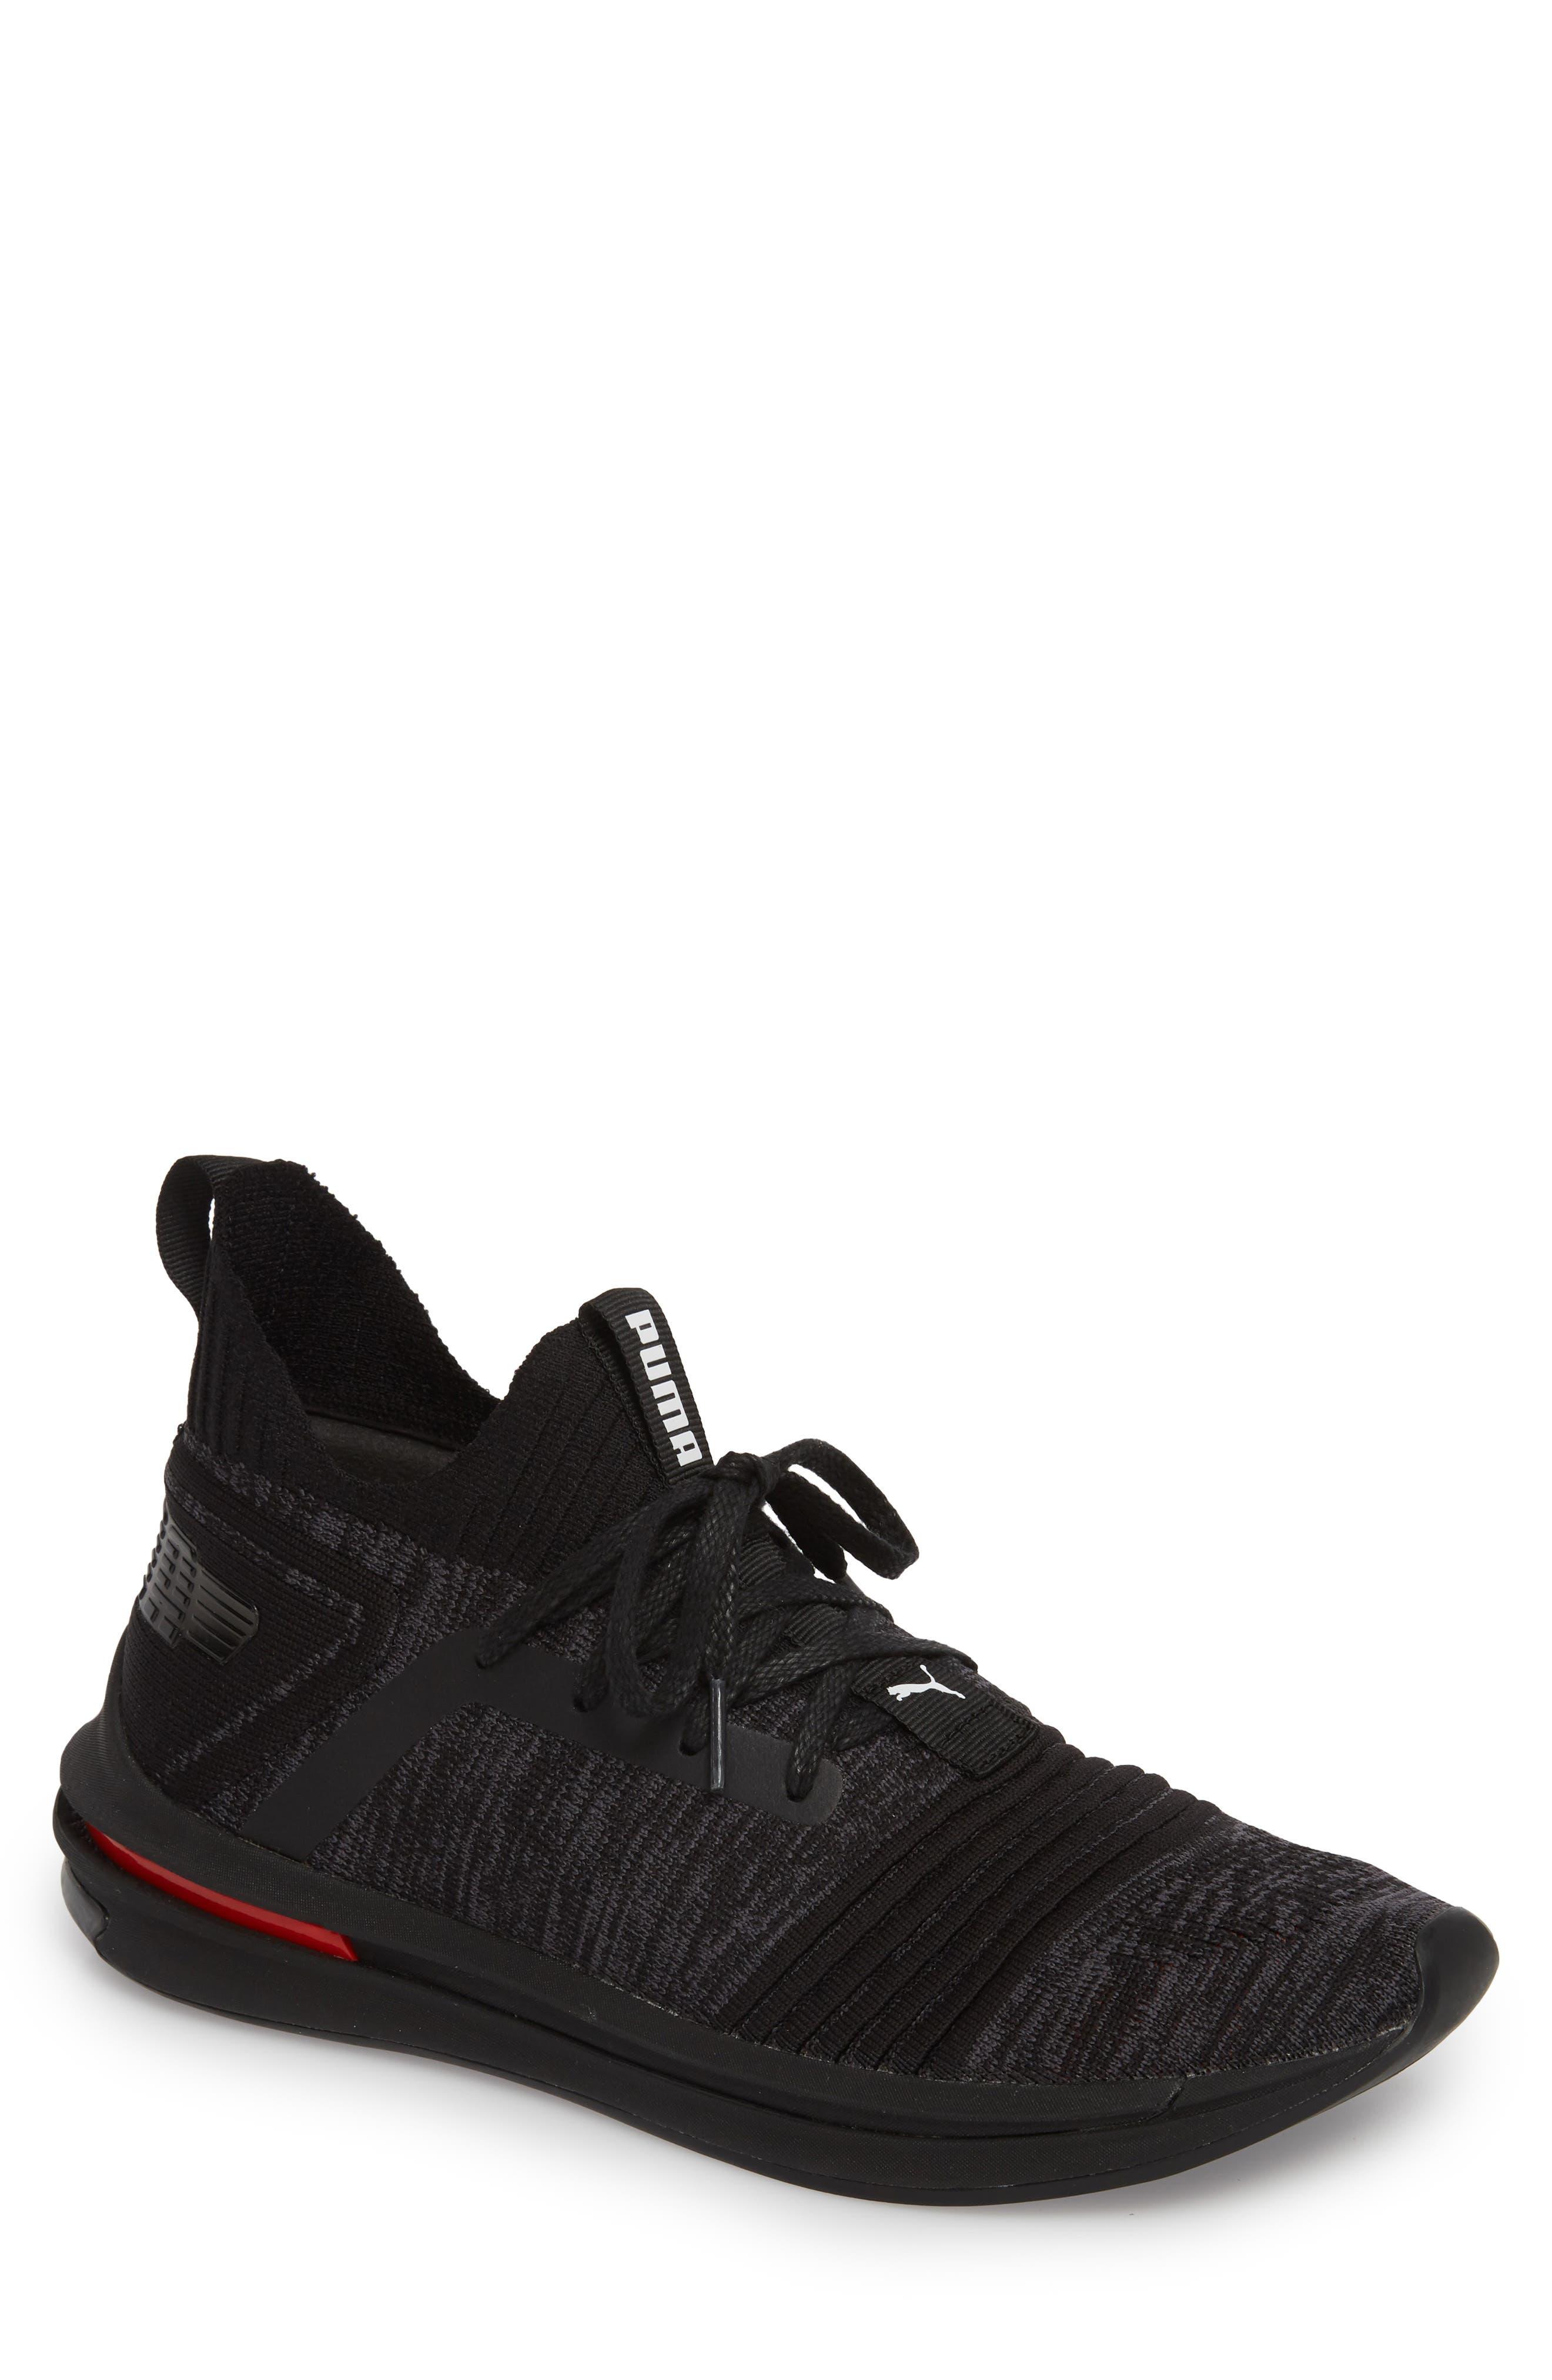 IGNITE Limitless SR evoKNIT Sneaker,                         Main,                         color, 001